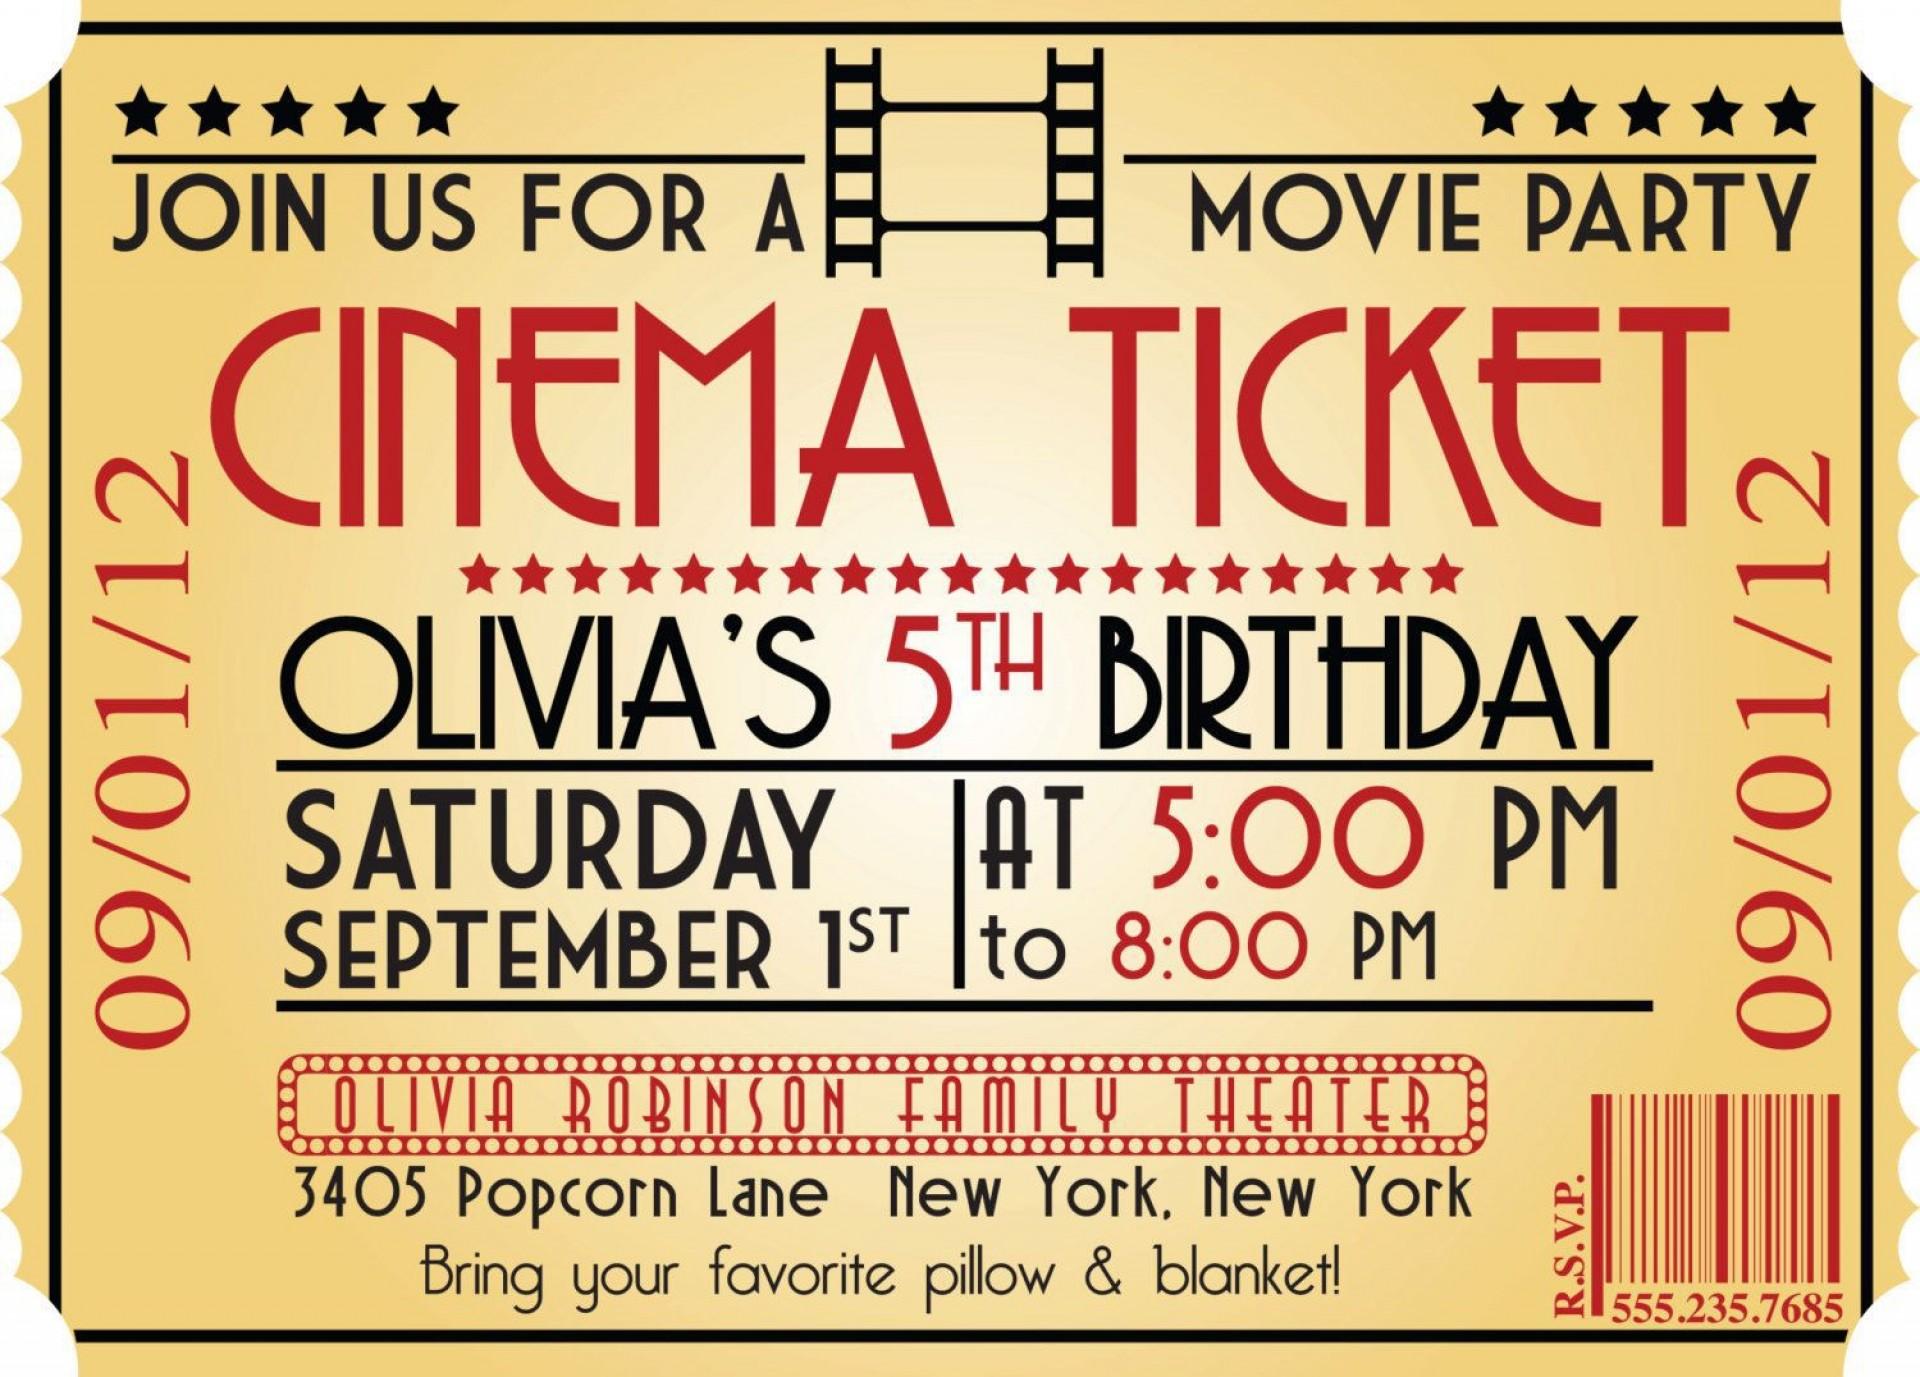 005 Marvelou Free Printable Movie Ticket Birthday Party Invitation Example 1920